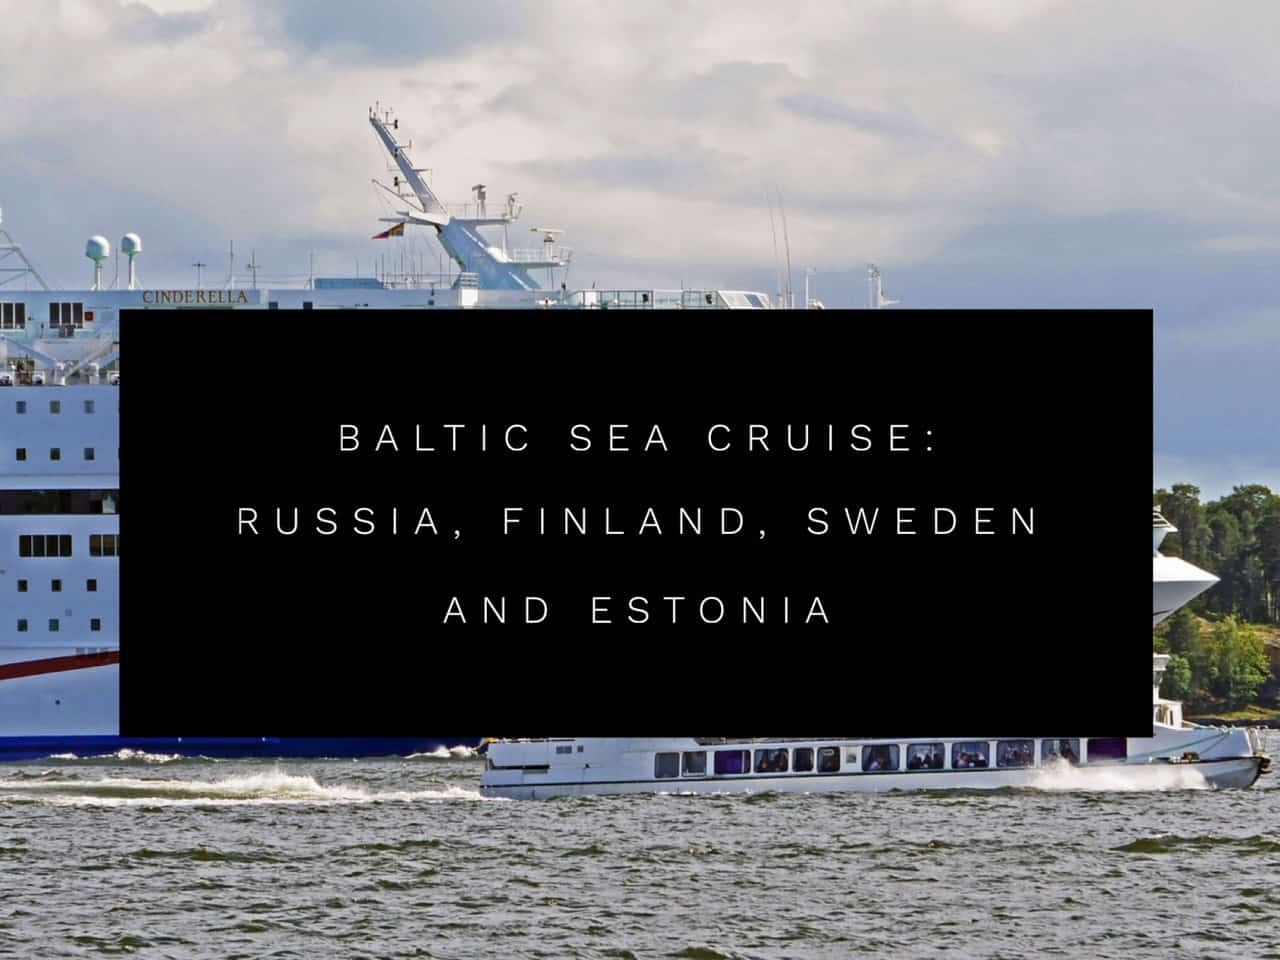 Baltic Sea Cruise St Petersburg Helsinki Stockholm And Tallinn